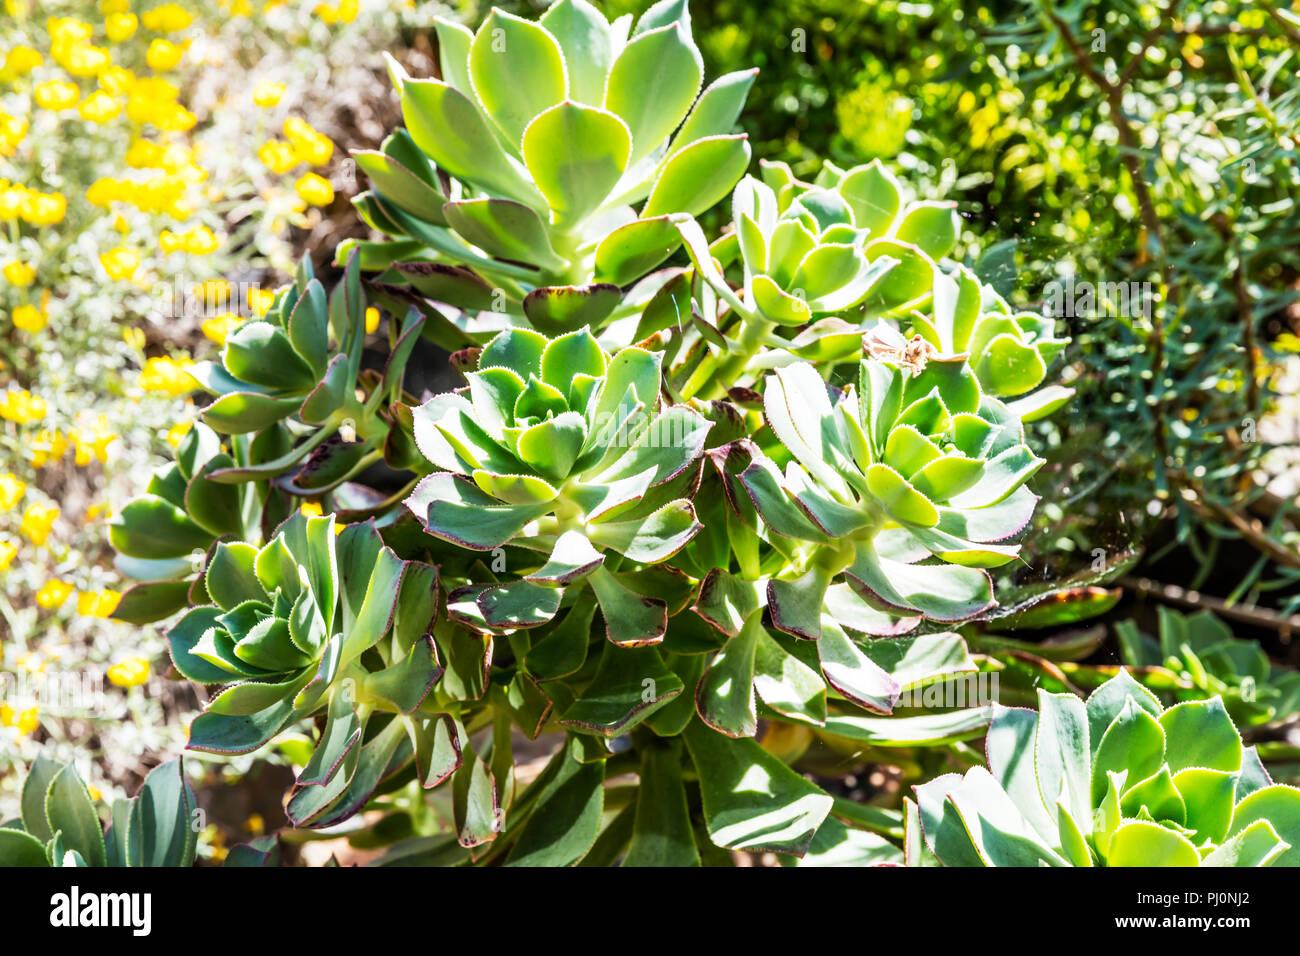 aeonium percarneum, Aeonium Kiwi, Kiwi Aeonium,  succulent, tree houseleek, aeonium percarneum Kiwi, succulent plant, plant, plants, leaves - Stock Image